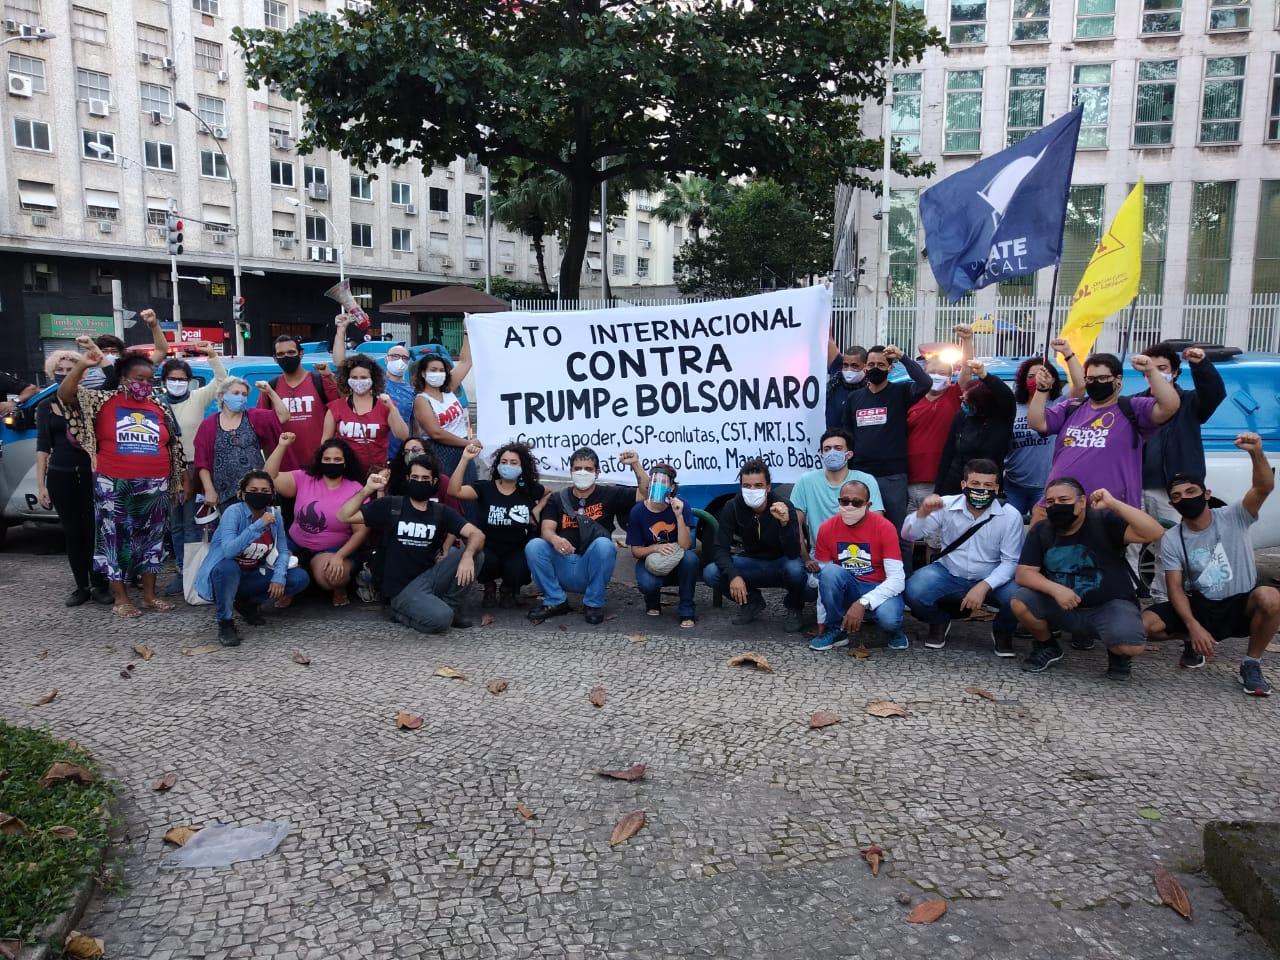 Rio de Janeiro - Jornada del 27 de Agosto